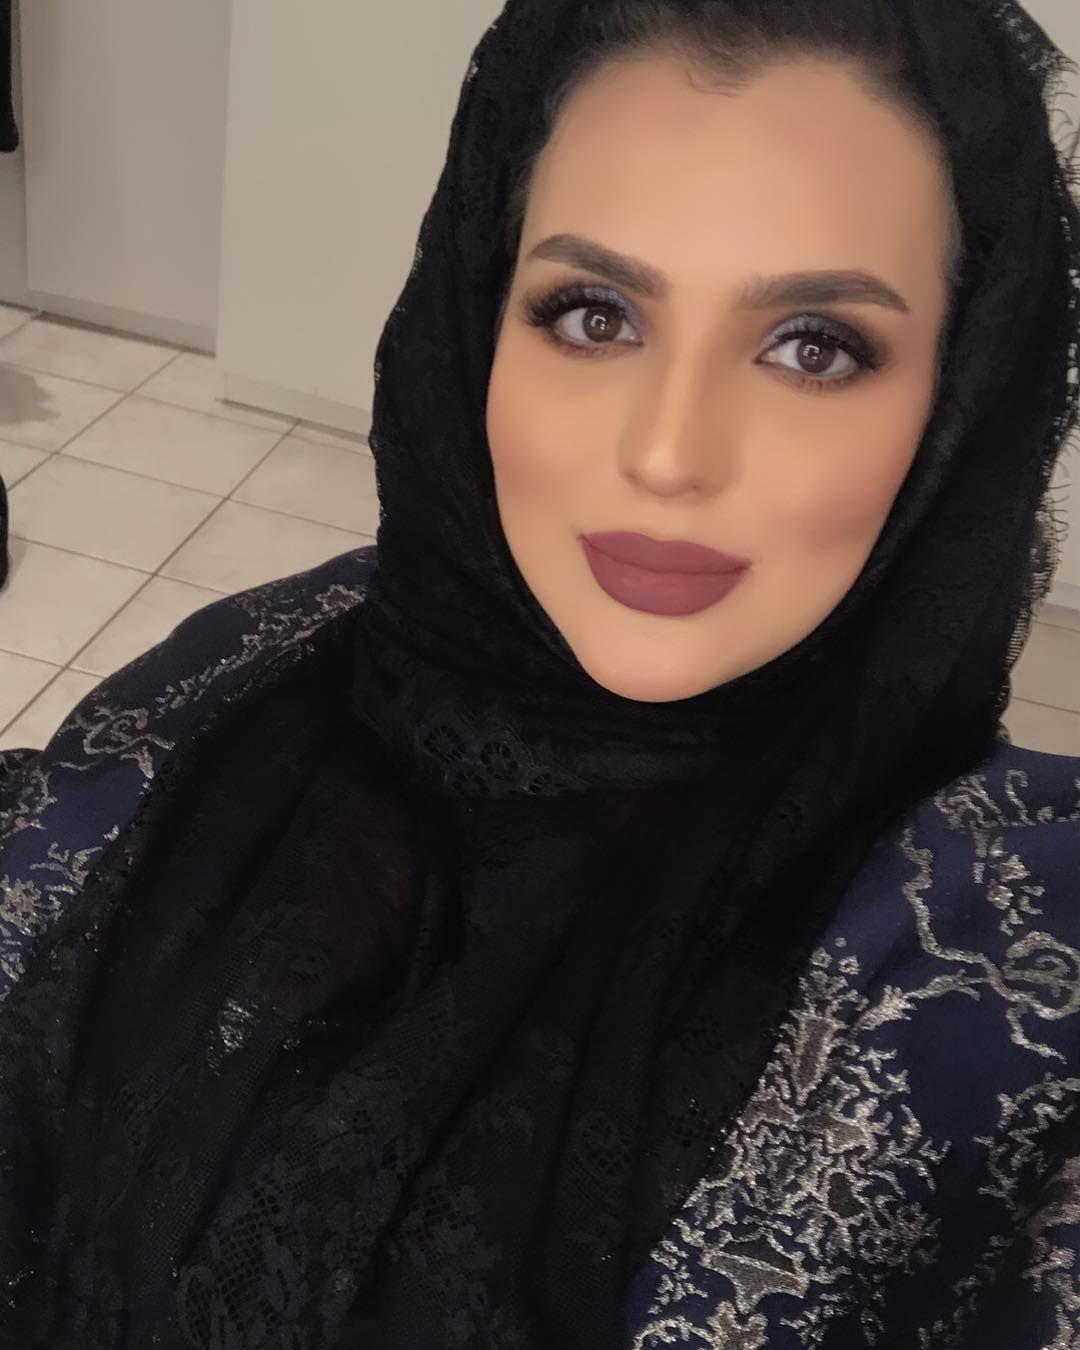 اشتقنا Makeup Art Lipstick Eyelashes Love Boutiqaat Kuwait Ladies Fun Passion Friendship Beauty مكياج حب جمال روج ال Makeup Lady Fashion